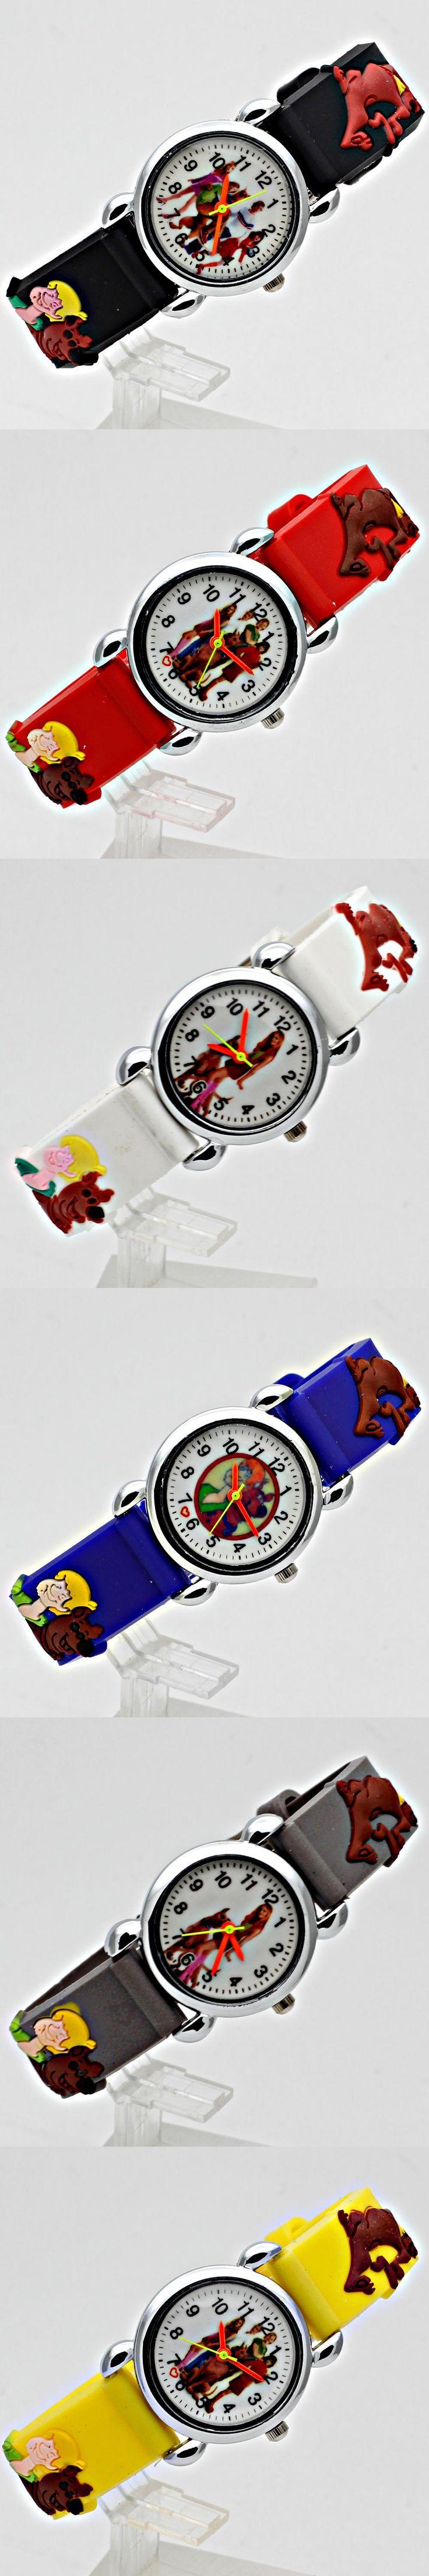 o1 2017 10pcs Hot sale Watch New Fashion Child Watch Silicon Cartoon Kids Sport Watch Boys quartz watch Relojes 3D Watch Relog